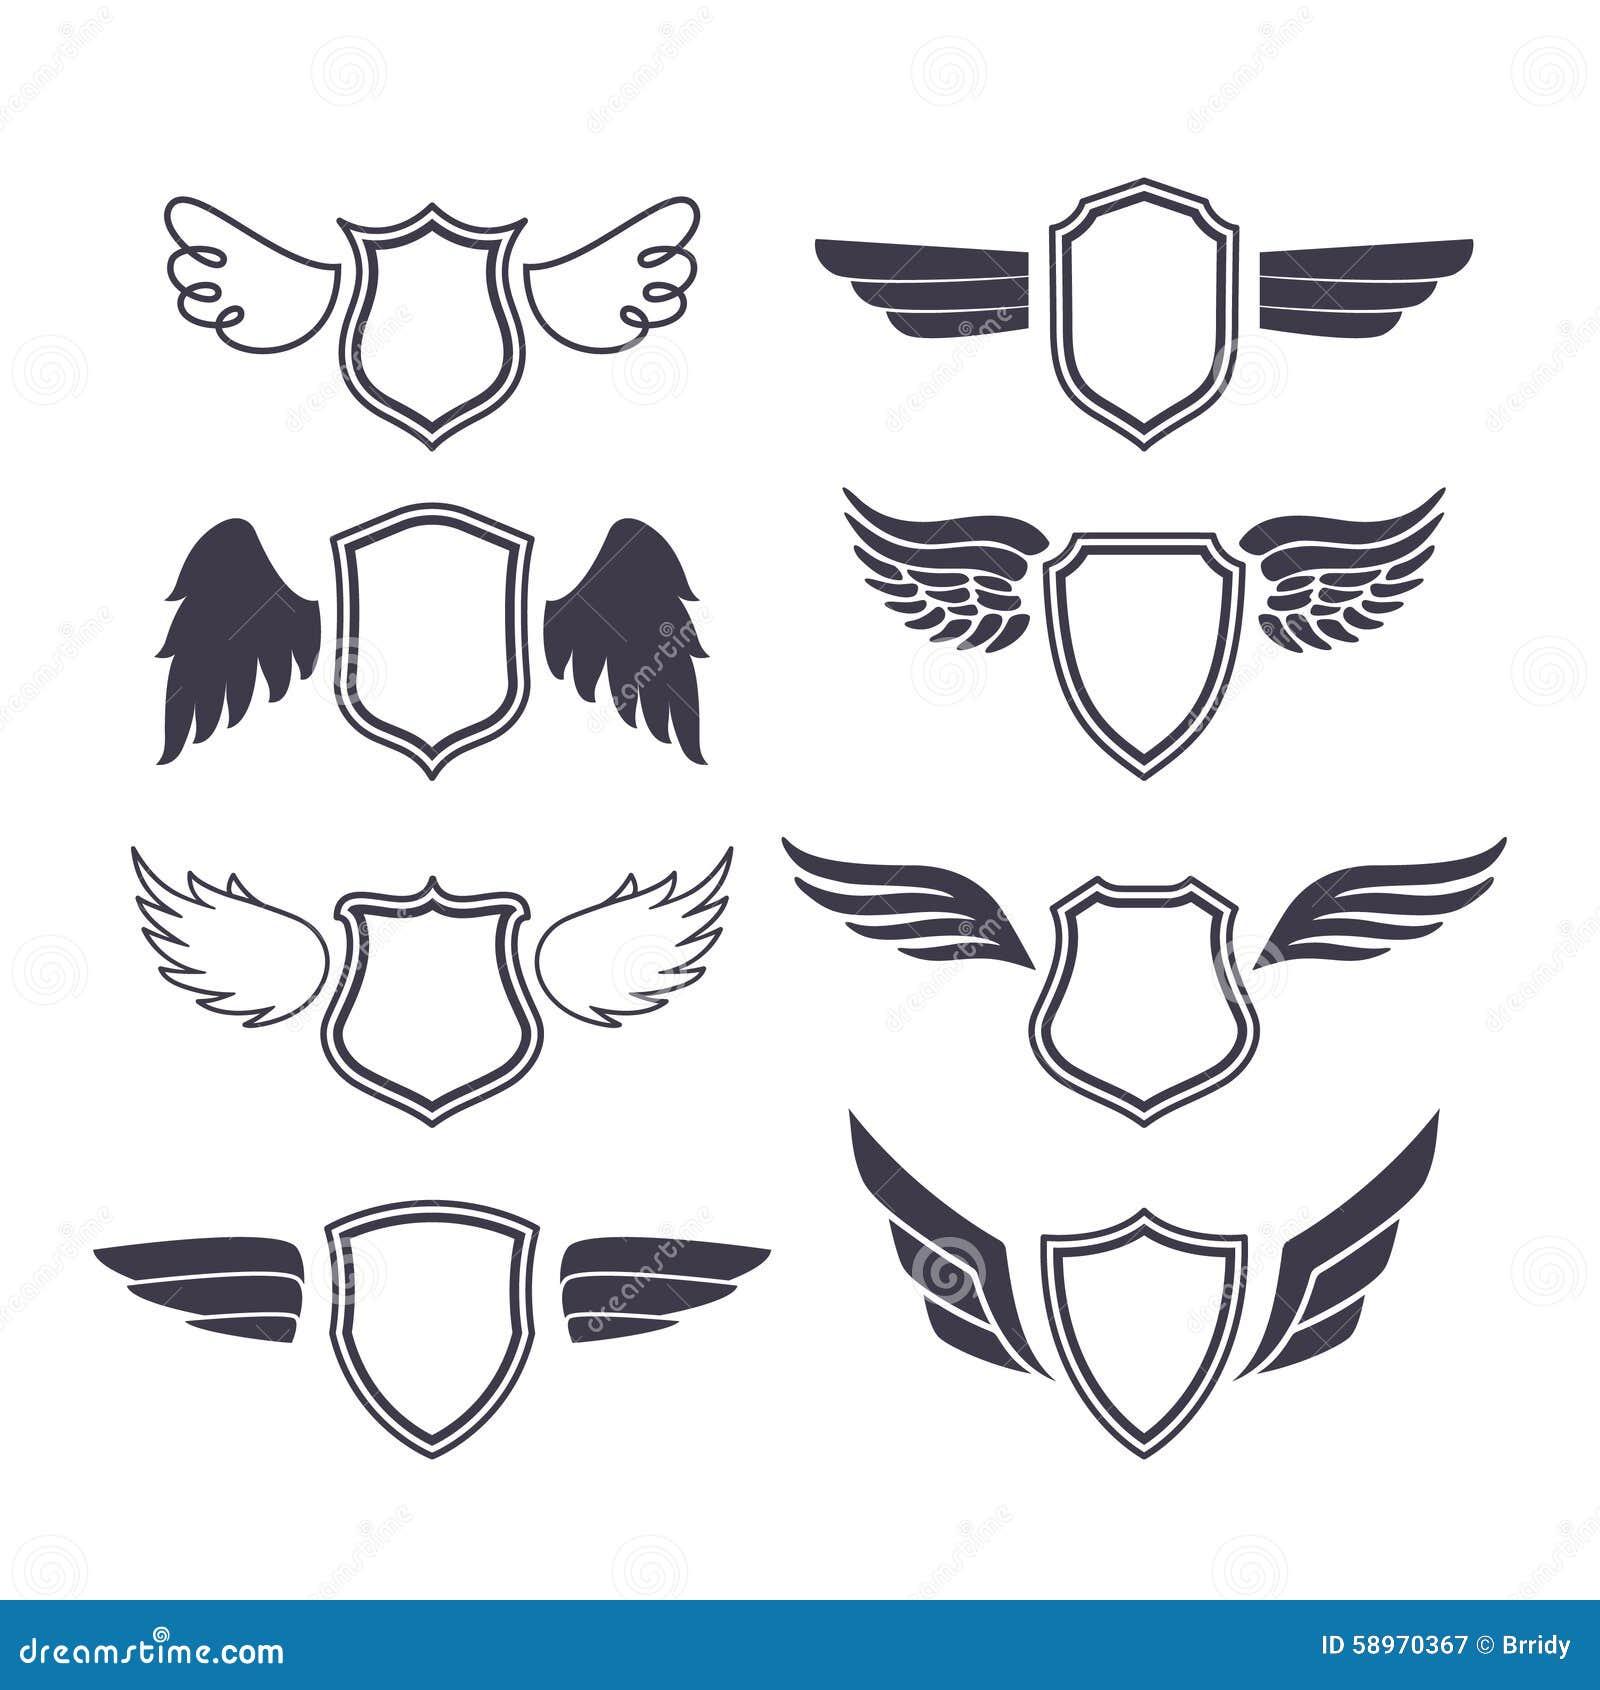 Consider, winged logos vintage phrase brilliant